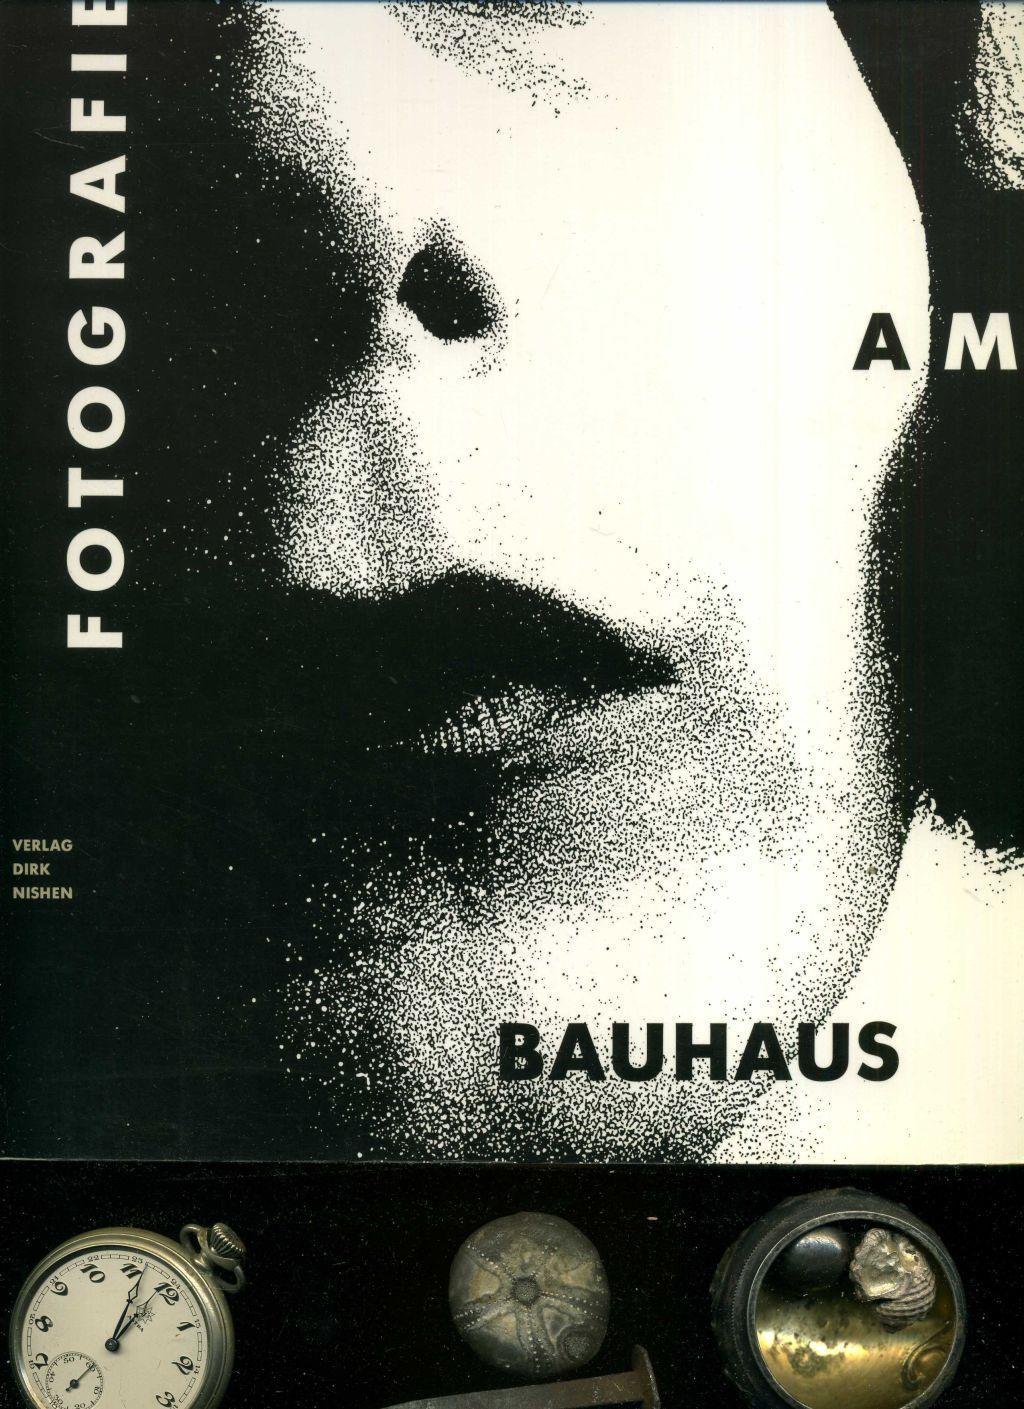 Fotografie am Bauhaus. Katalog und Ausstellung des Bauhaus- Archivs Berlin. - Jeannine Fiedler